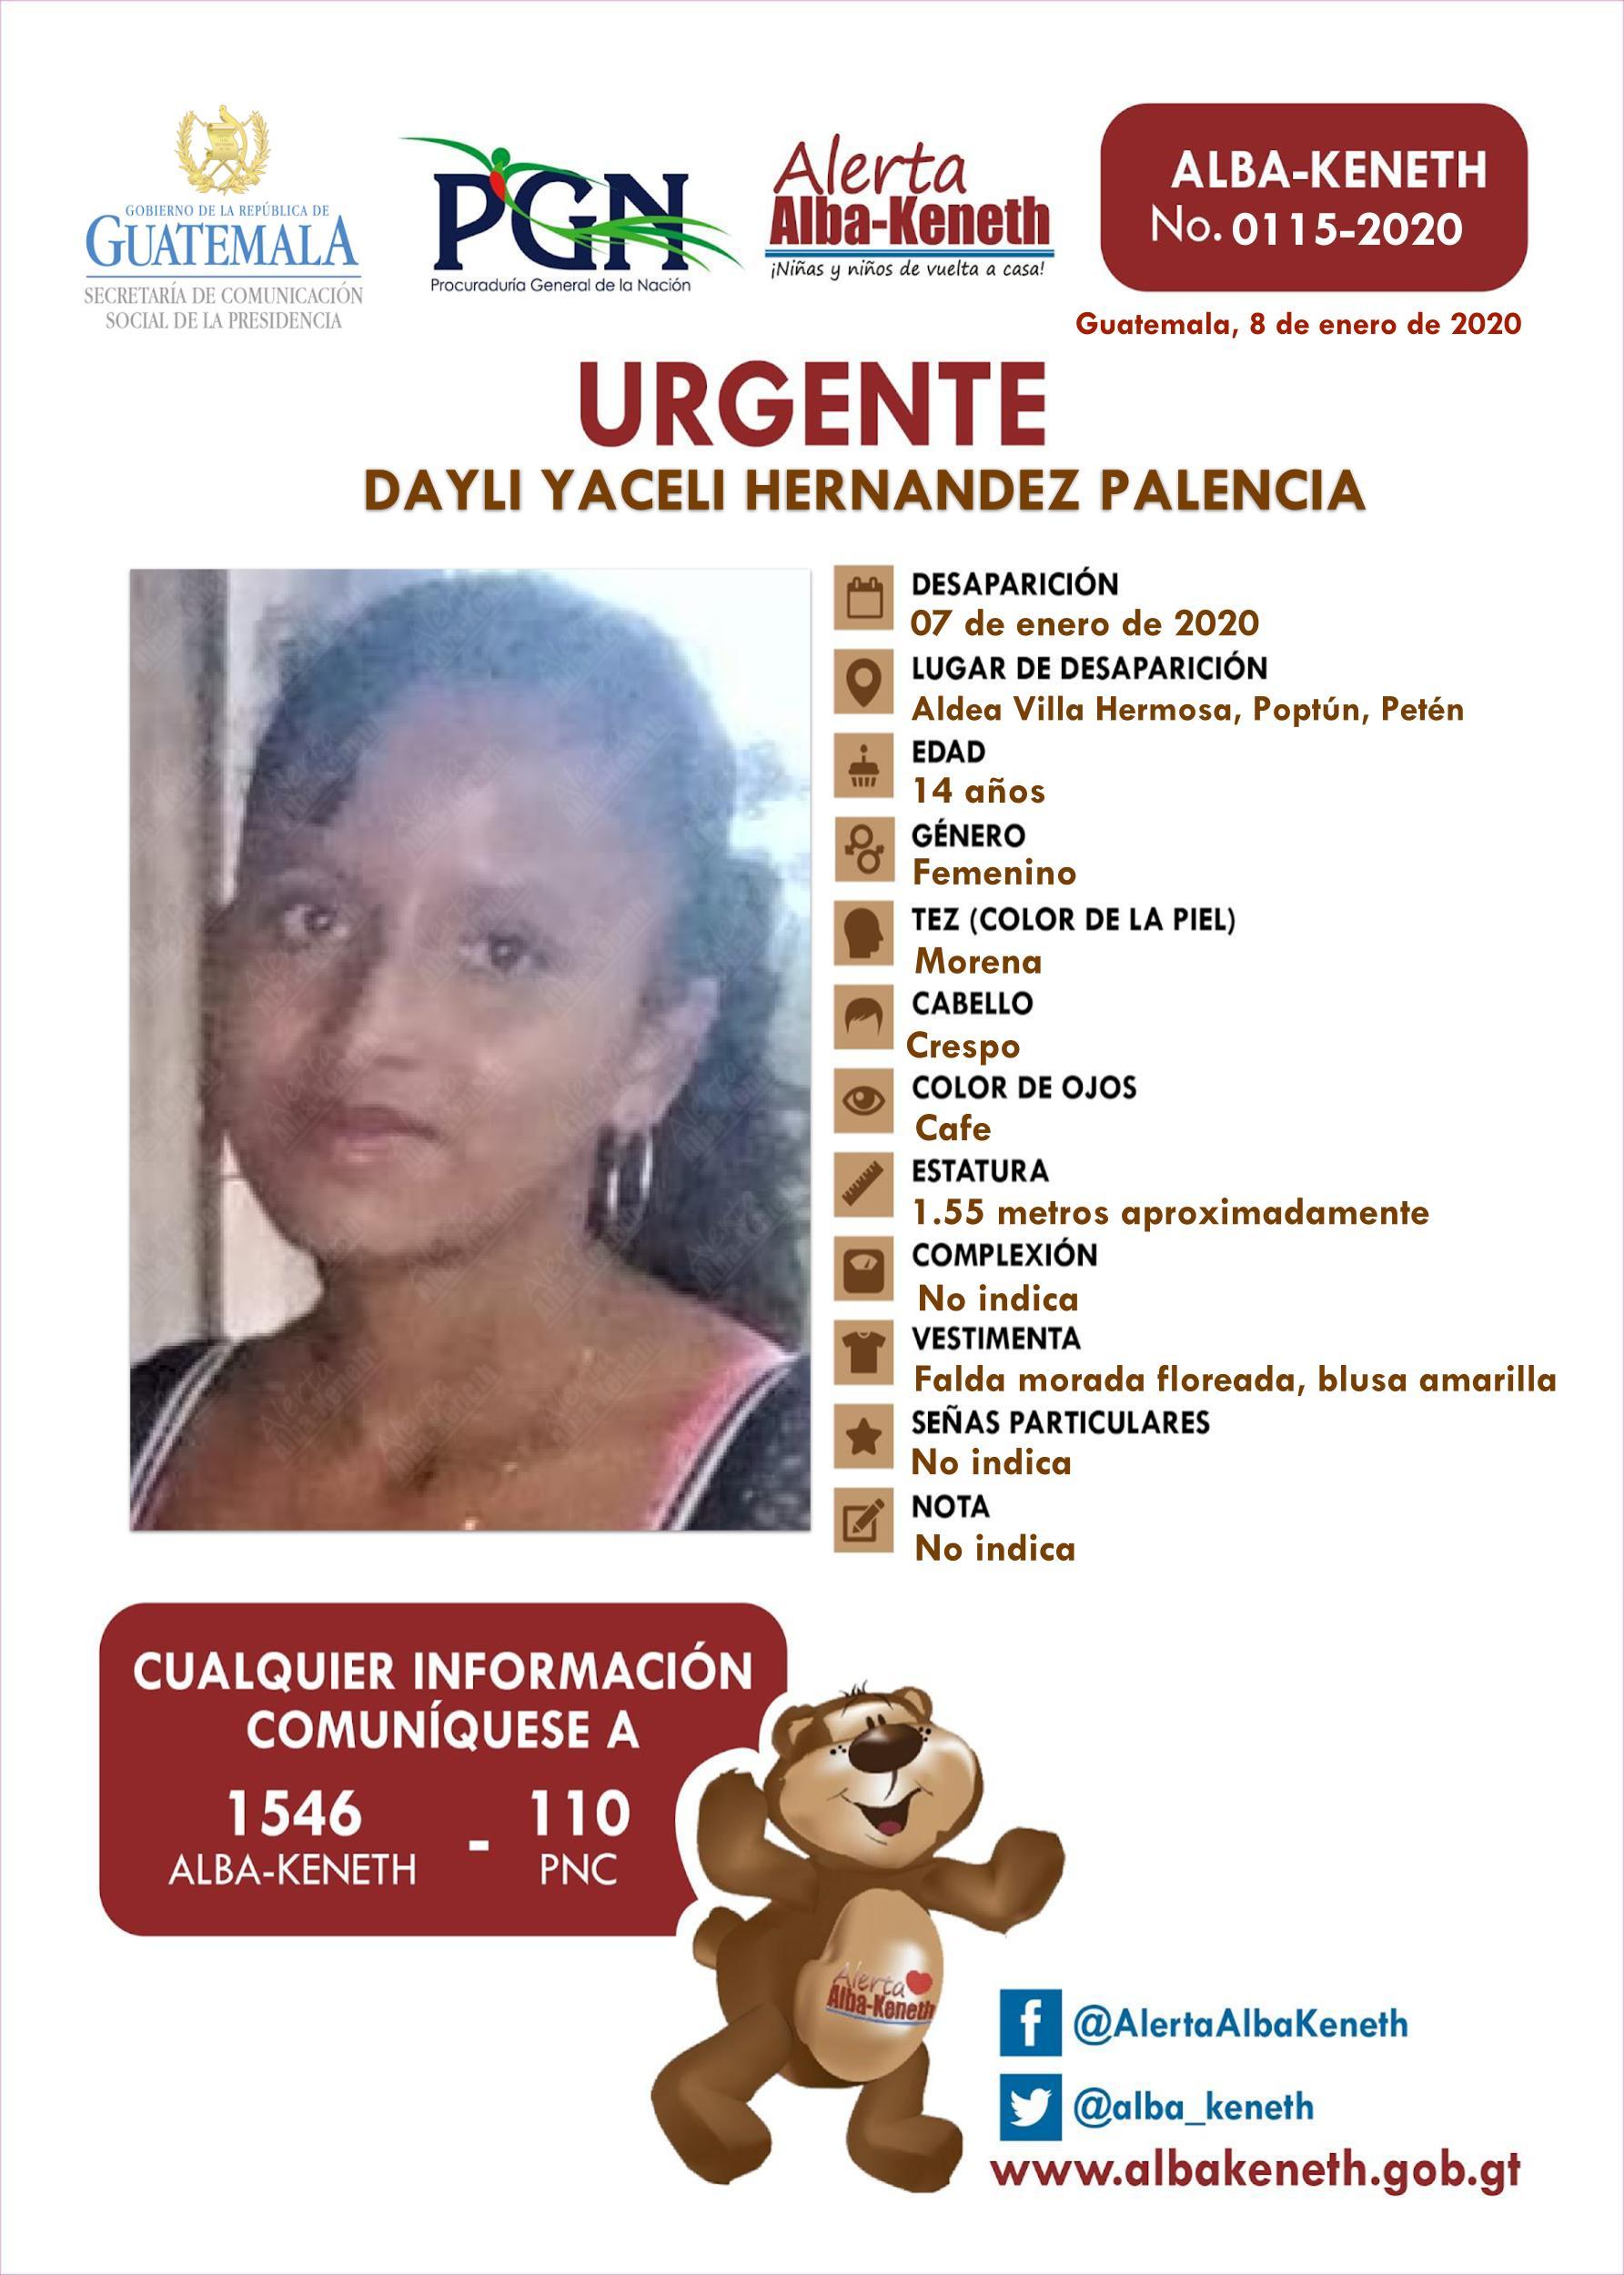 Dayli Yaceli Hernandez Palencia